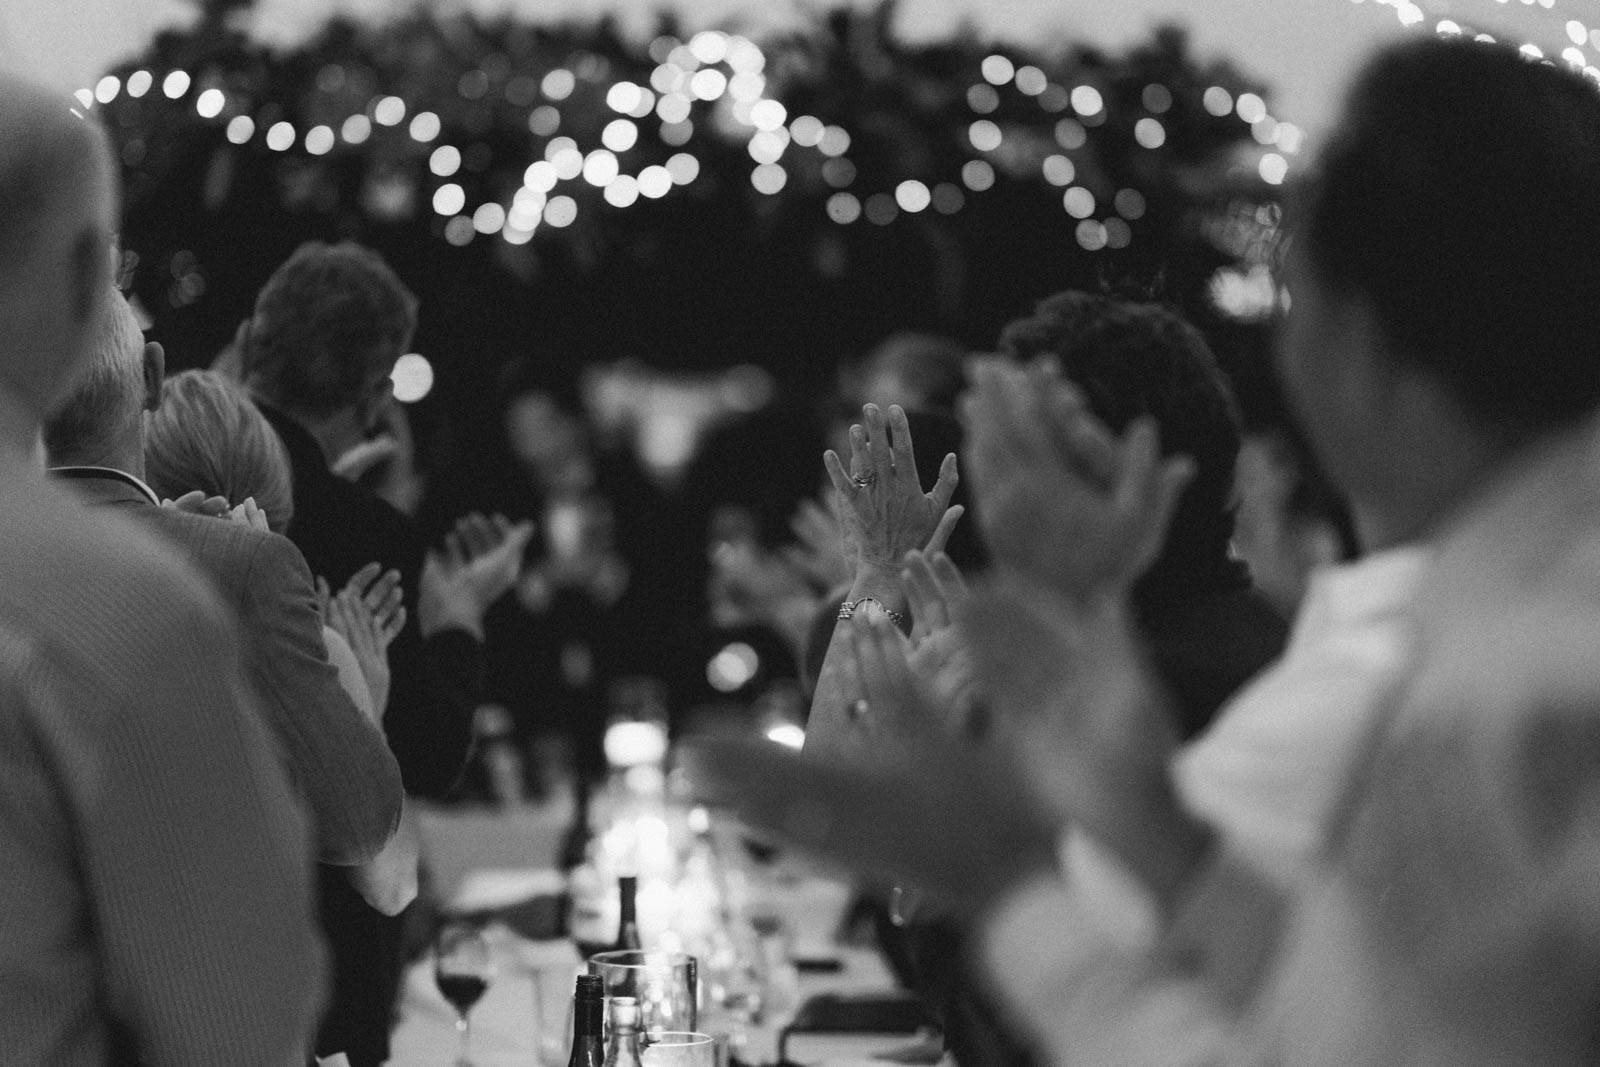 newfound-s-p-mt-maunganui-tauranga-wedding-photographer-2129-A9_09475